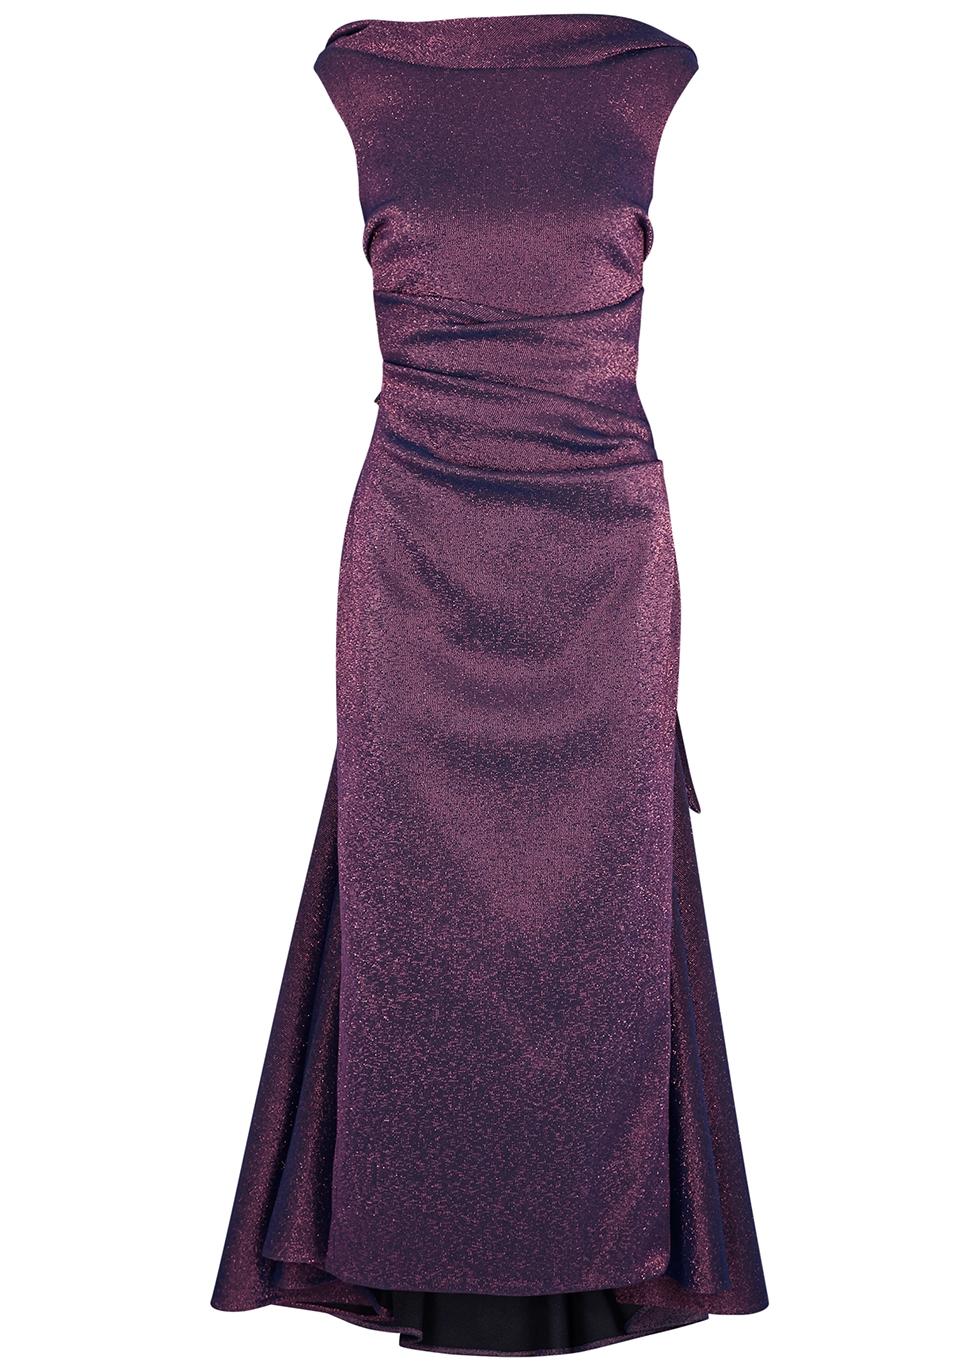 Tomislava1 metallic purple stretch-gazar gown